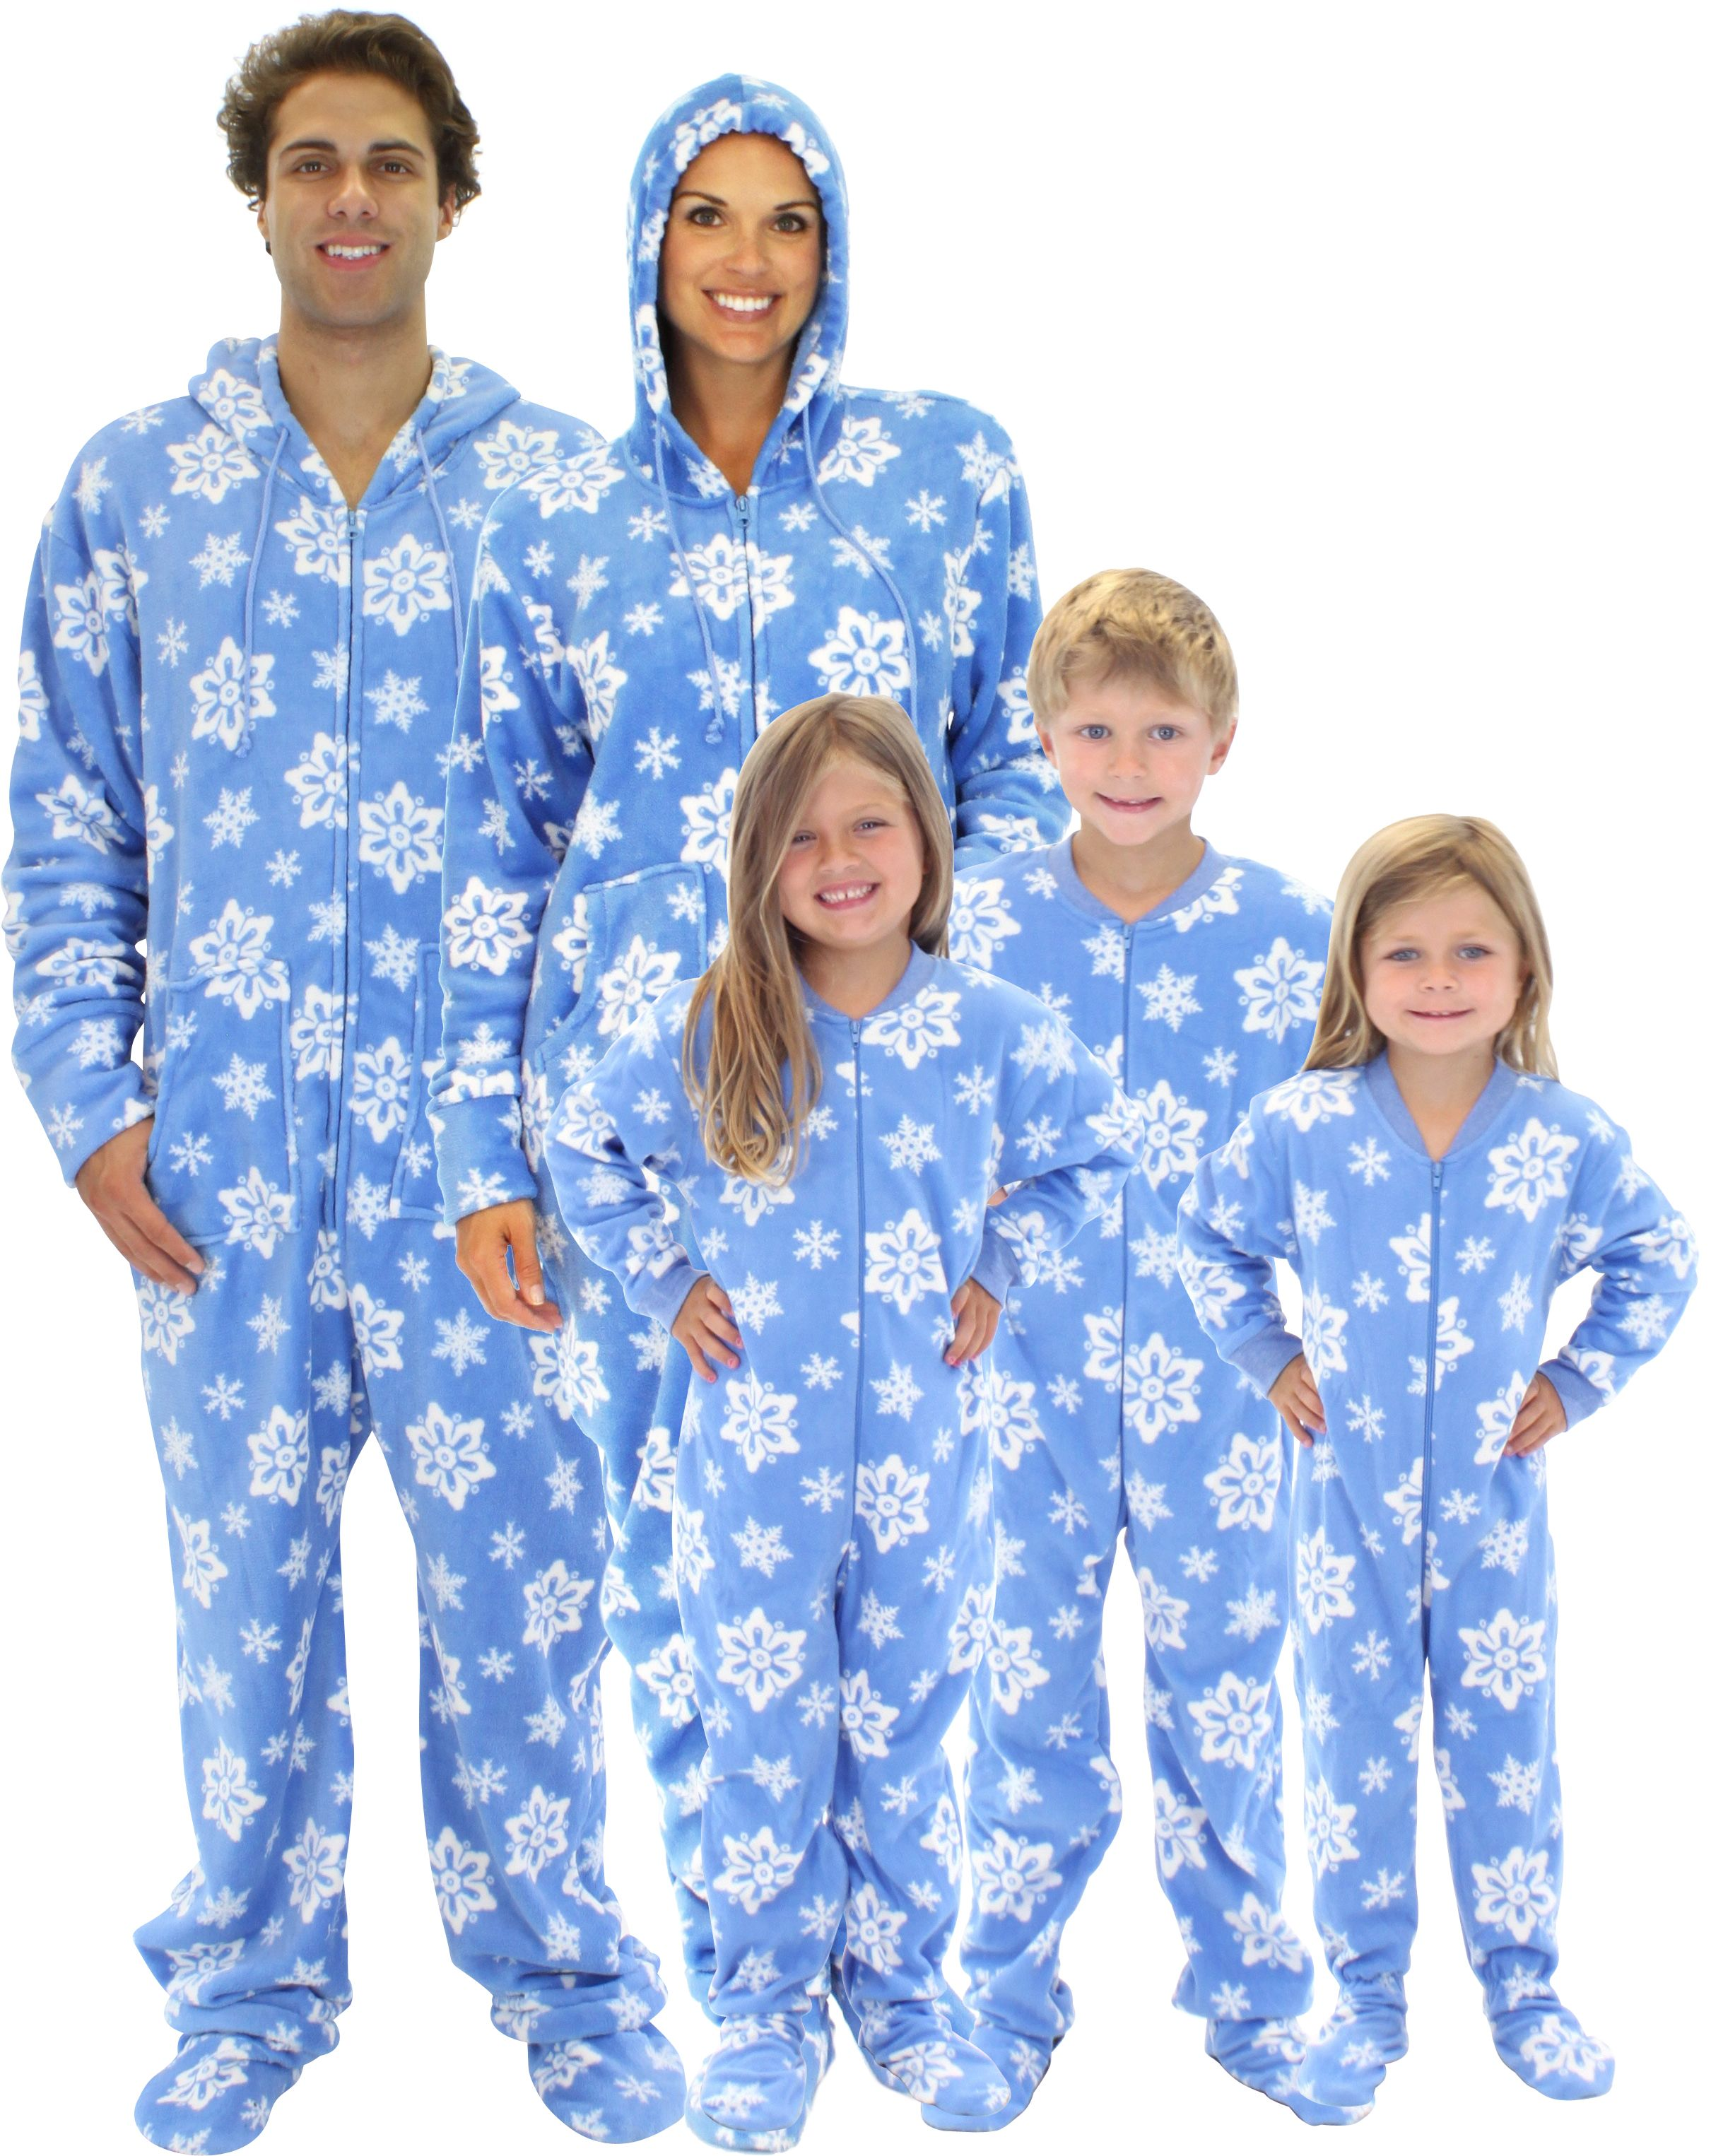 Holiday Matching Family Pajamas Blue Snowflakes Footed